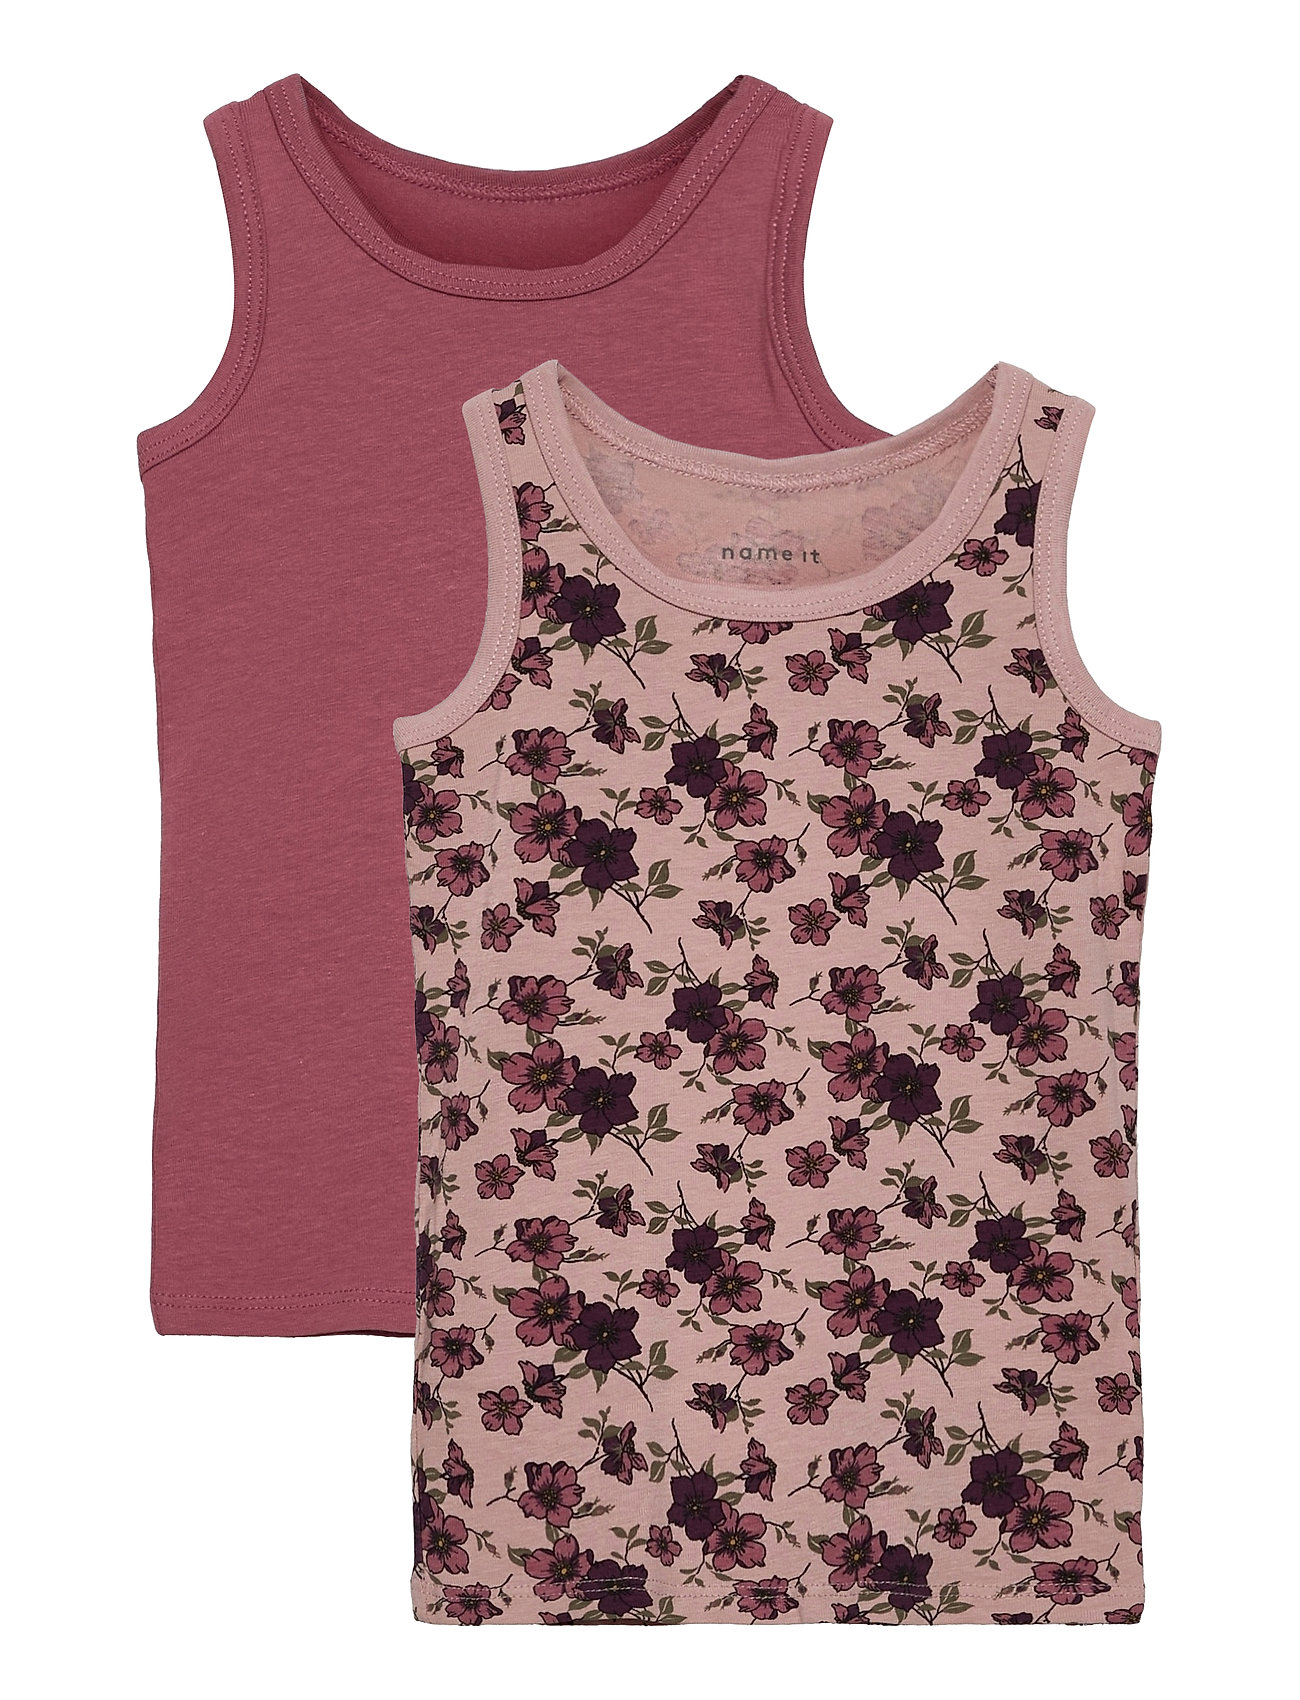 Nmftank Top 2p Deco Rose Flower T-shirt Ærmeløs Lyserød Name It